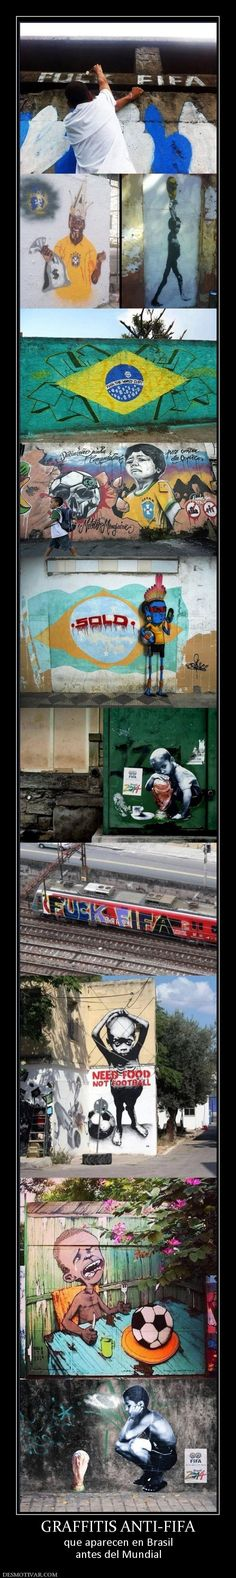 GRAFFITIS ANTI-FIFA que aparecen en Brasil antes del Mundial